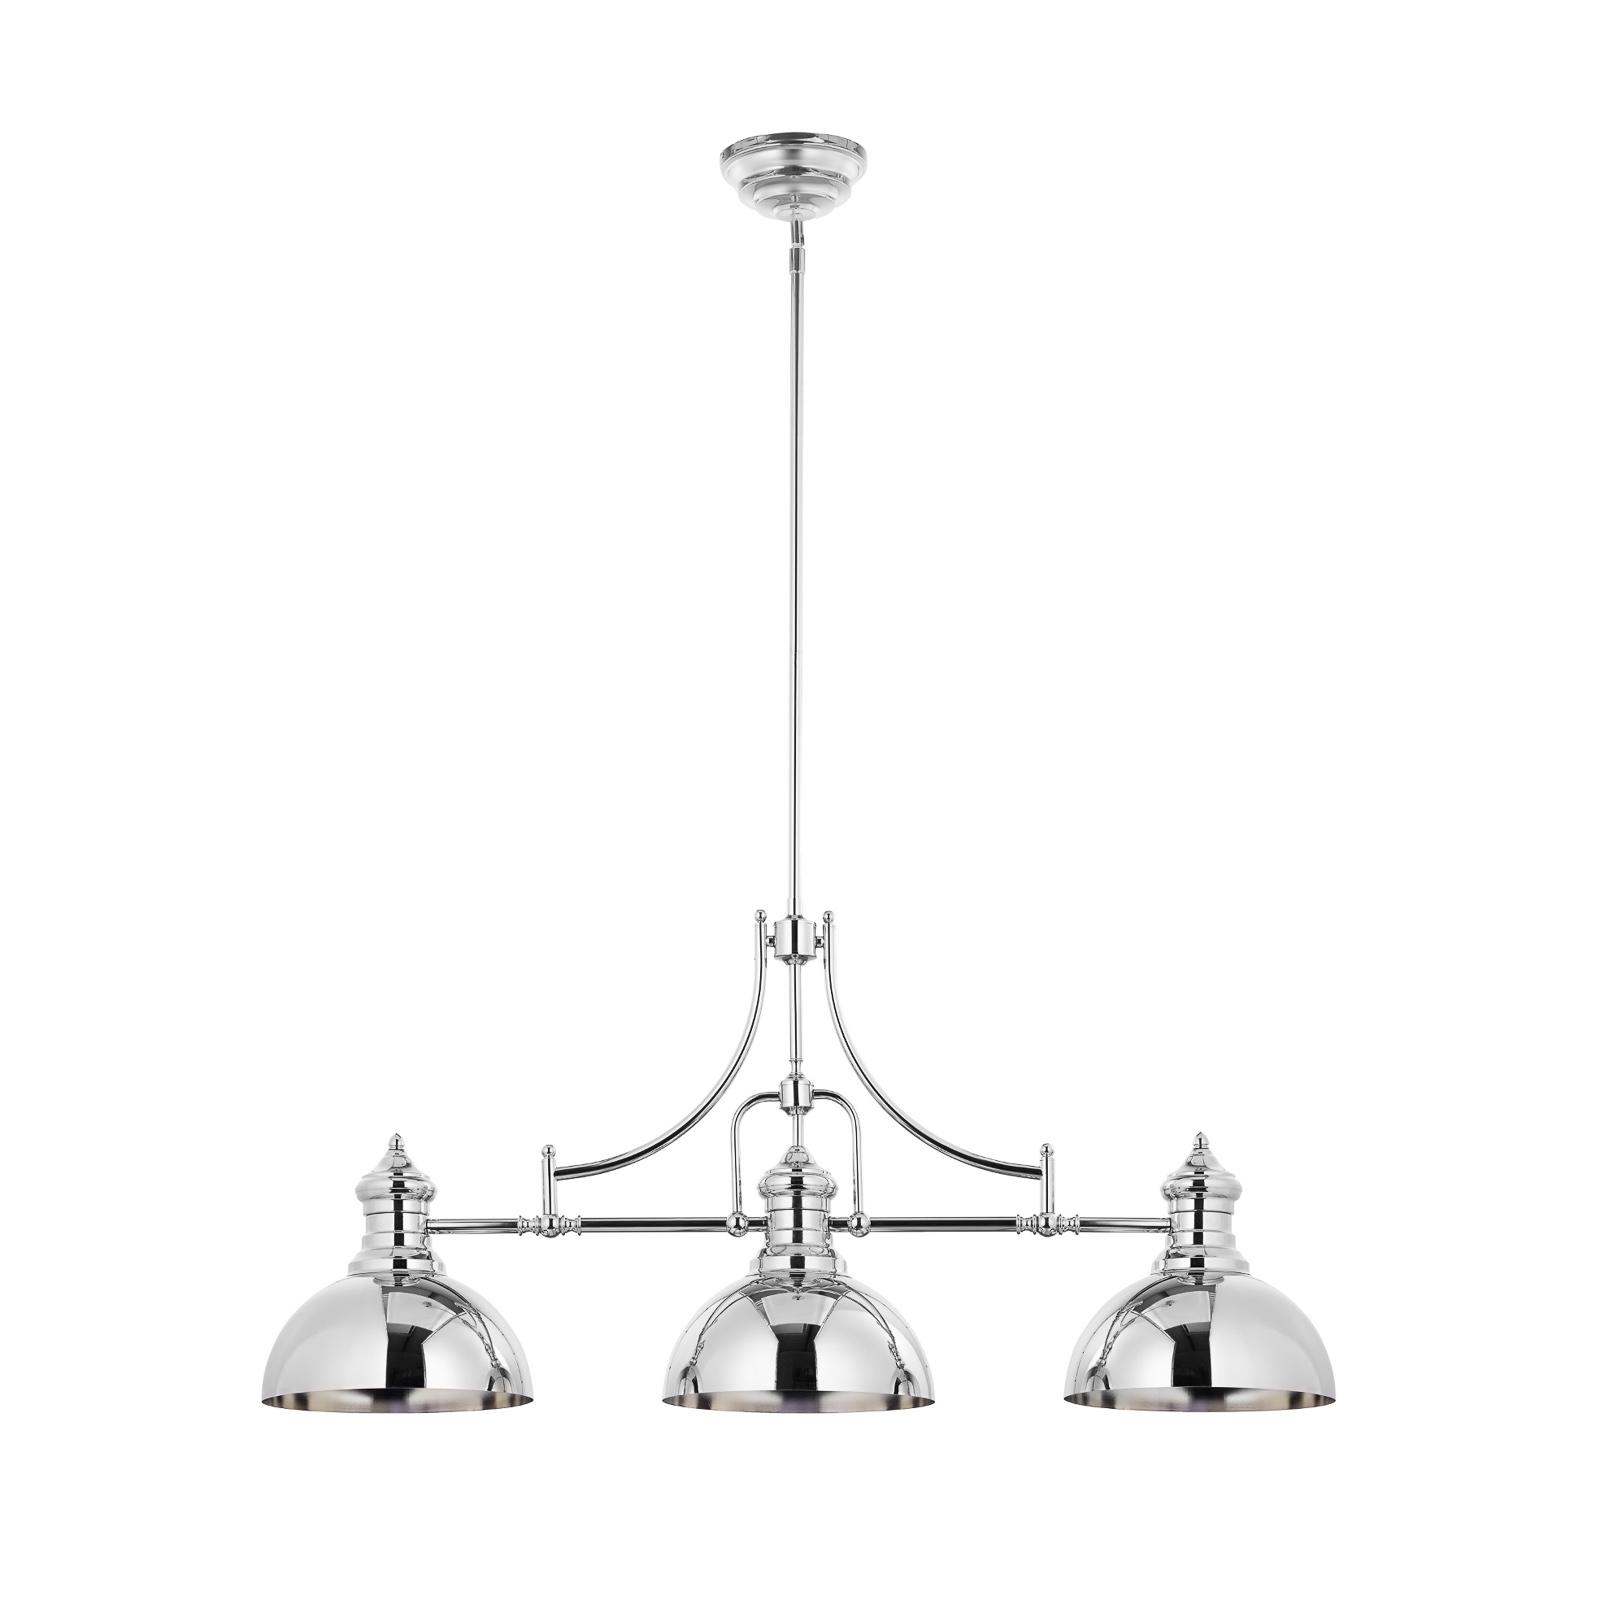 Hanglamp Times in nikkelafwerking, 3-lamps